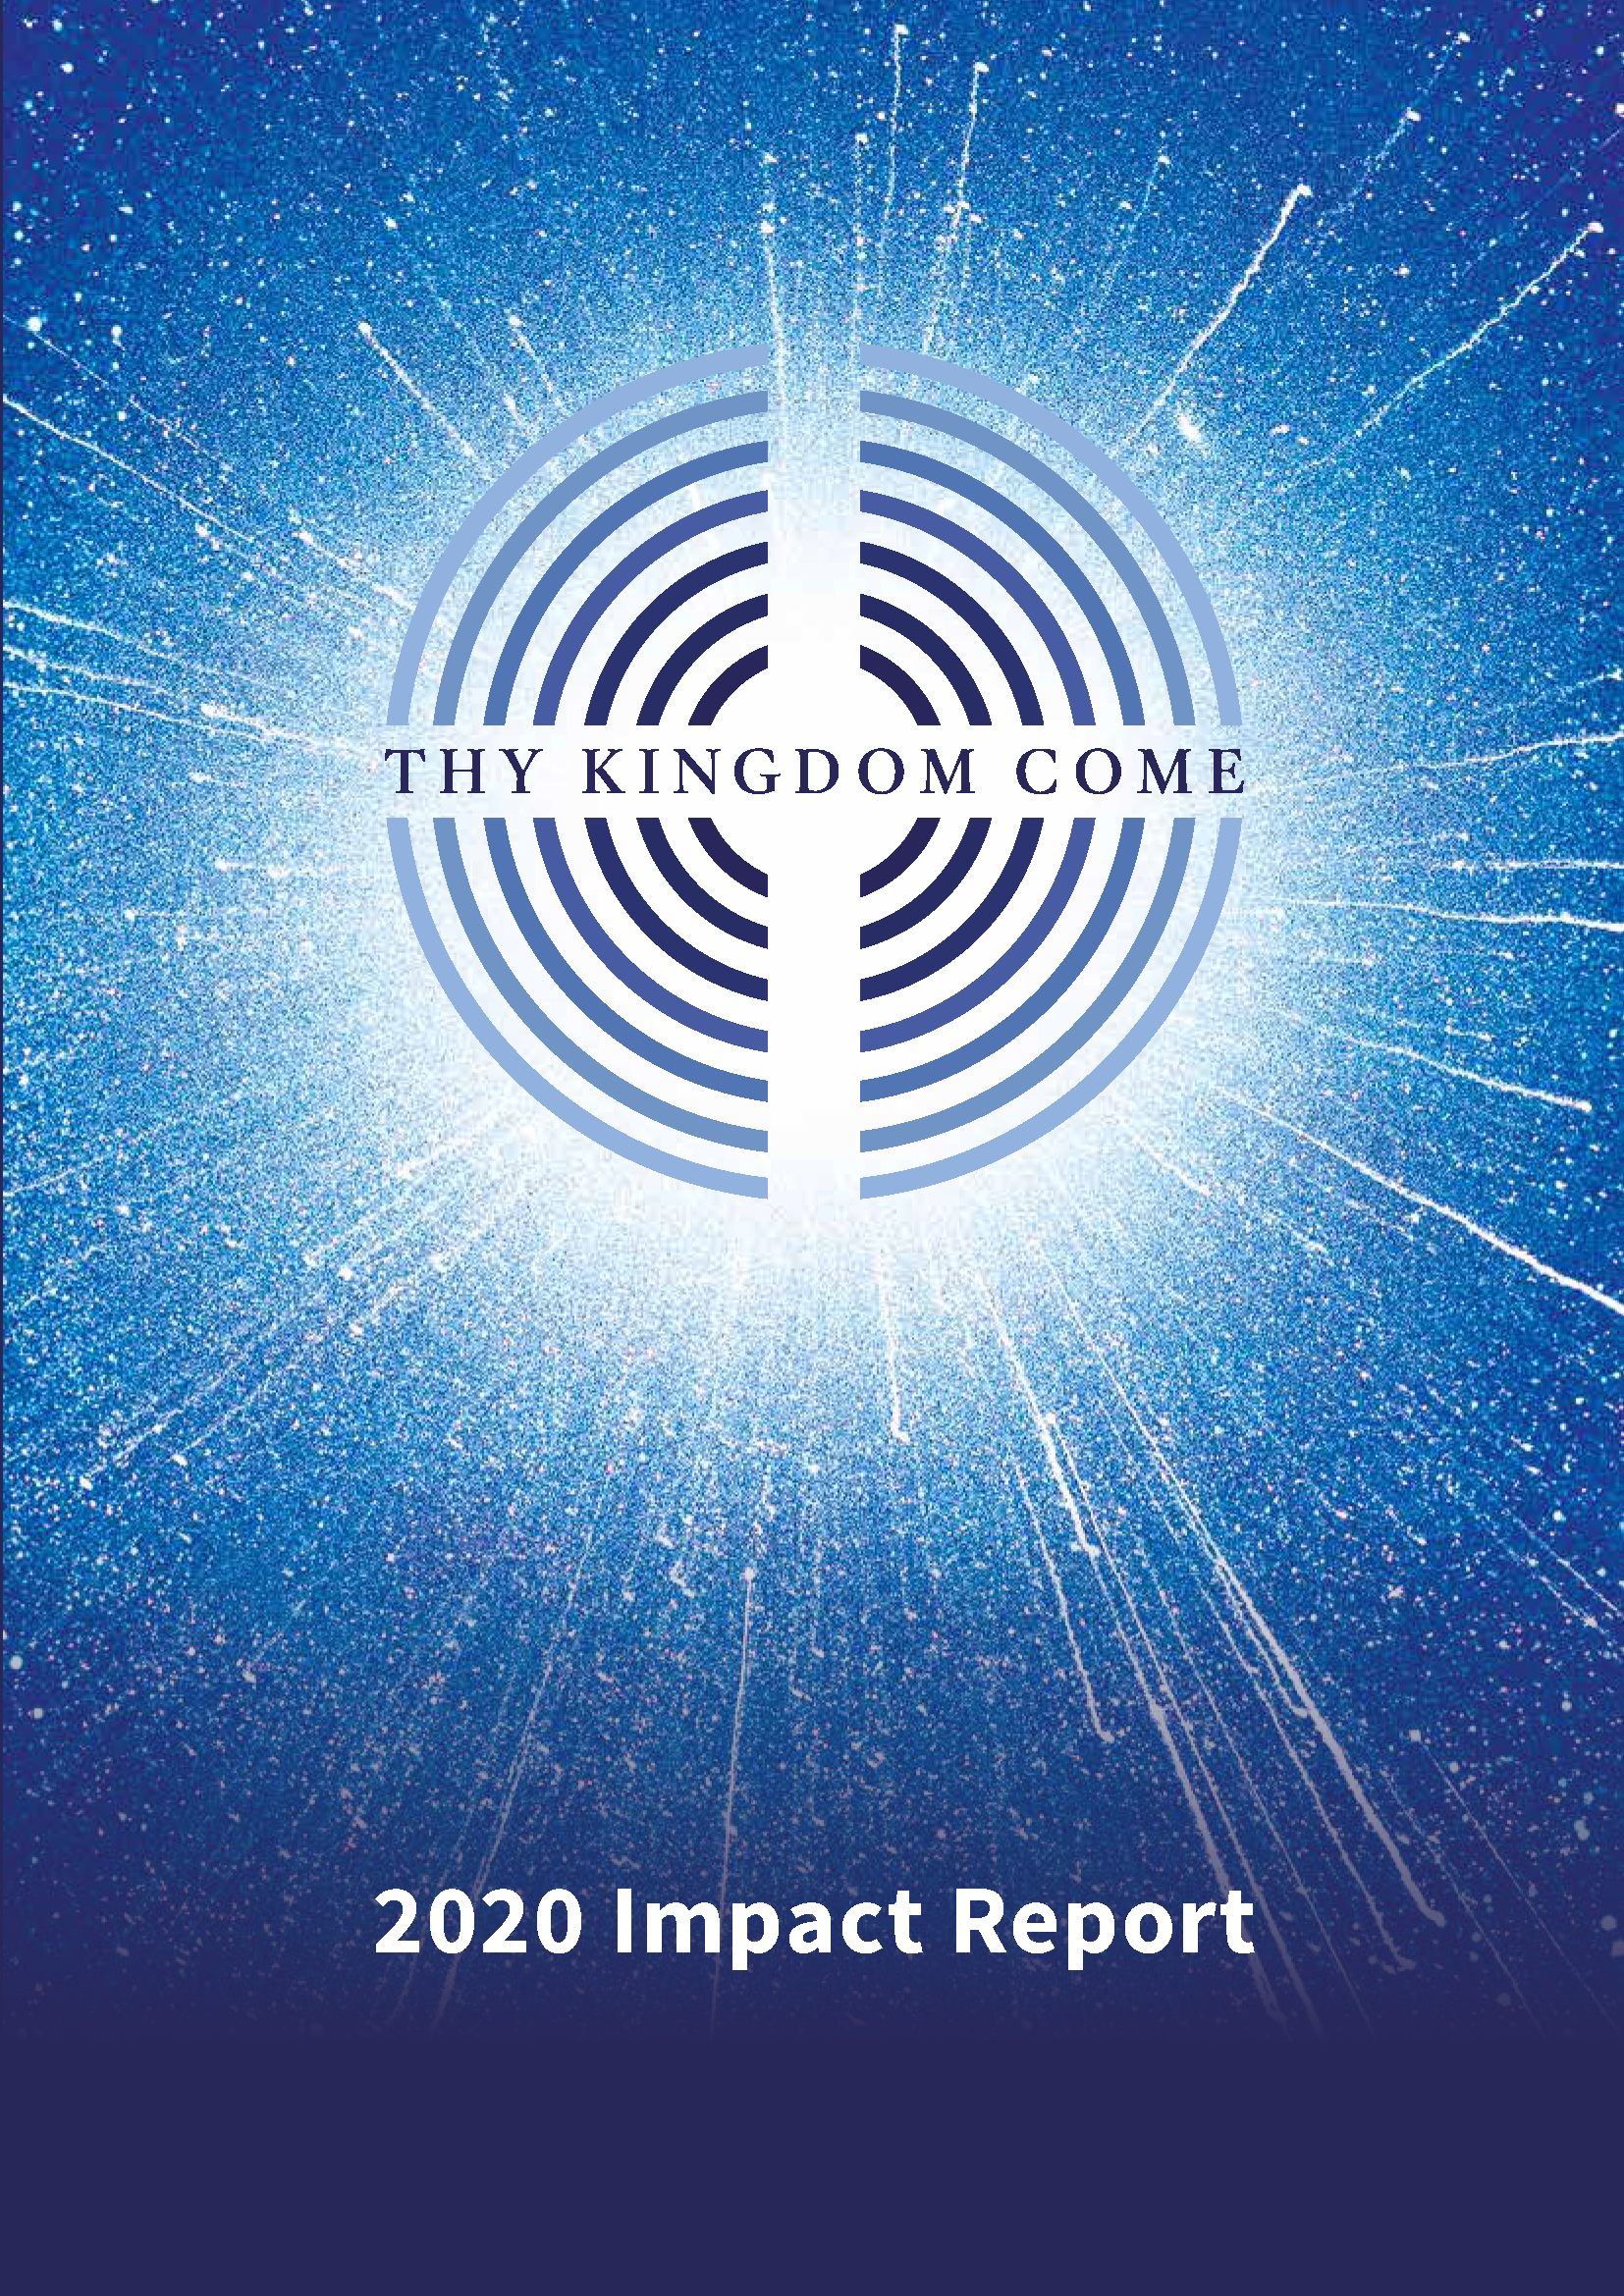 Thy Kingdom Come 2020 Impact Report